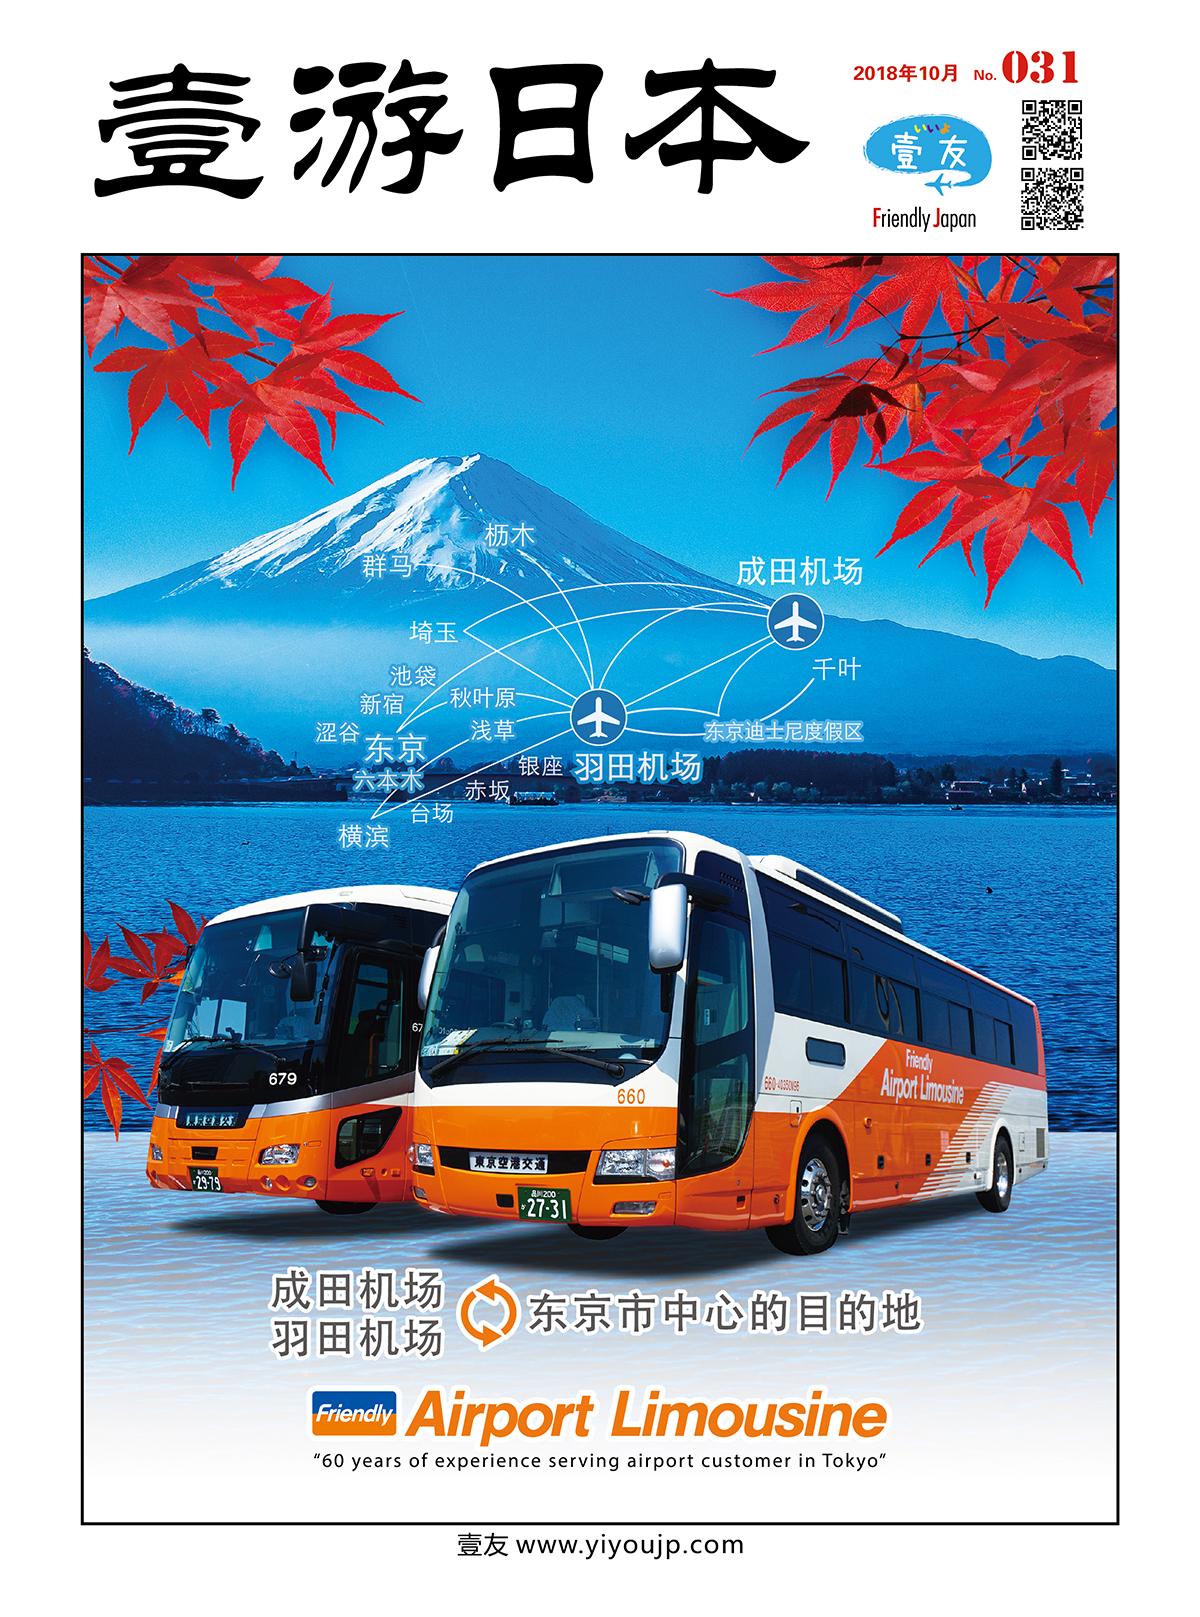 31th-封1 利木津巴士